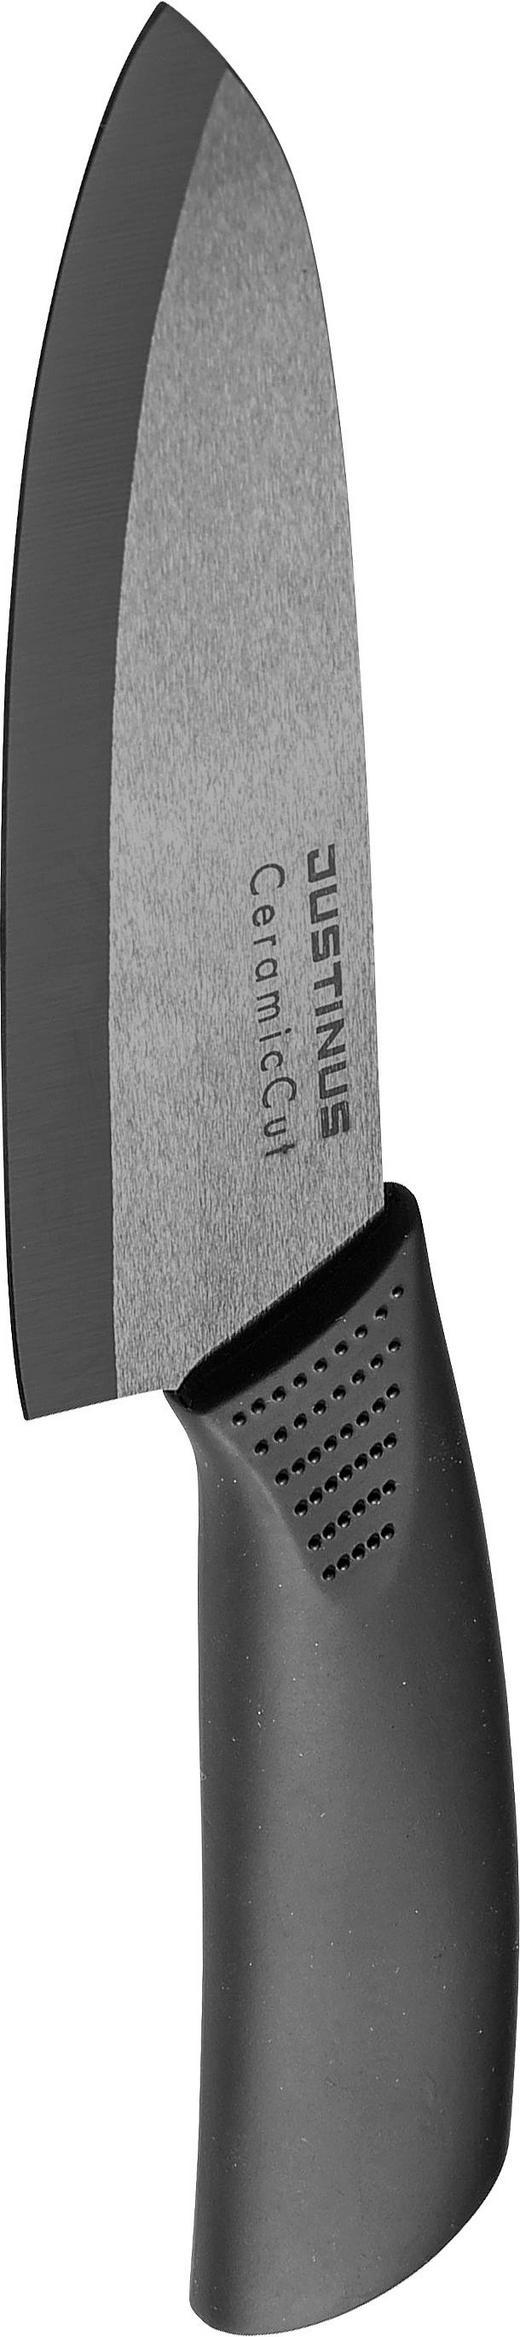 KOCHMESSER   33 cm - Schwarz, Basics, Keramik/Kunststoff (33cm) - JUSTINUS